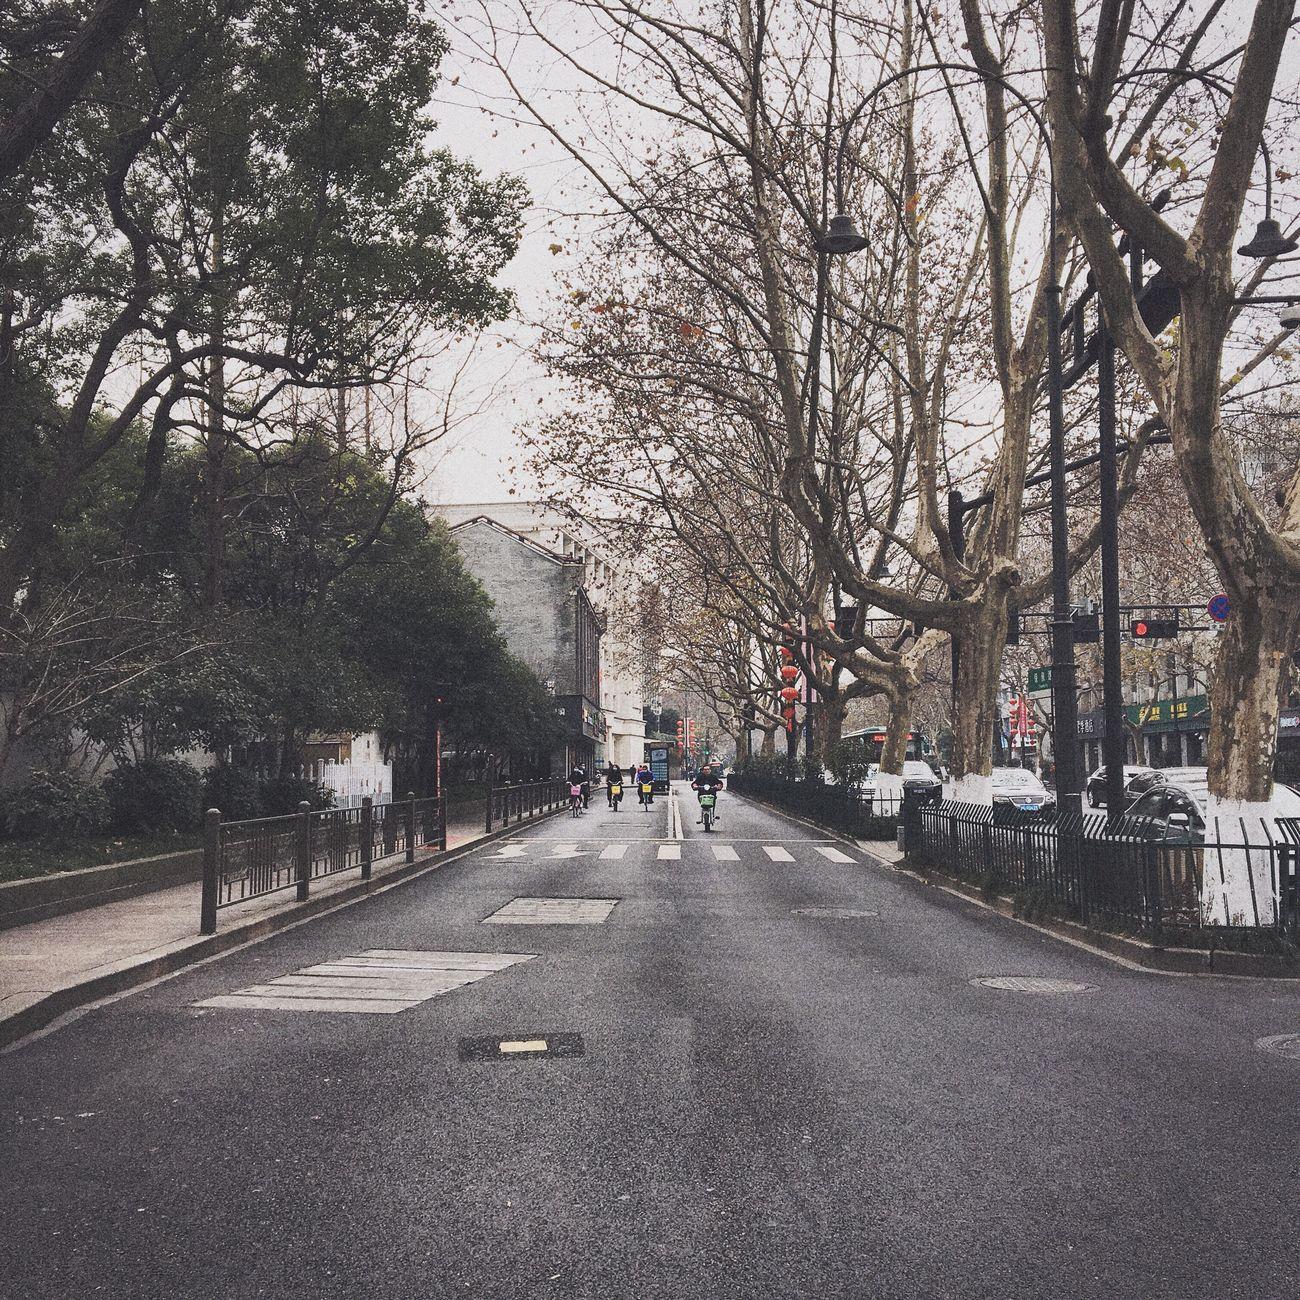 Walking Road Outdoors City